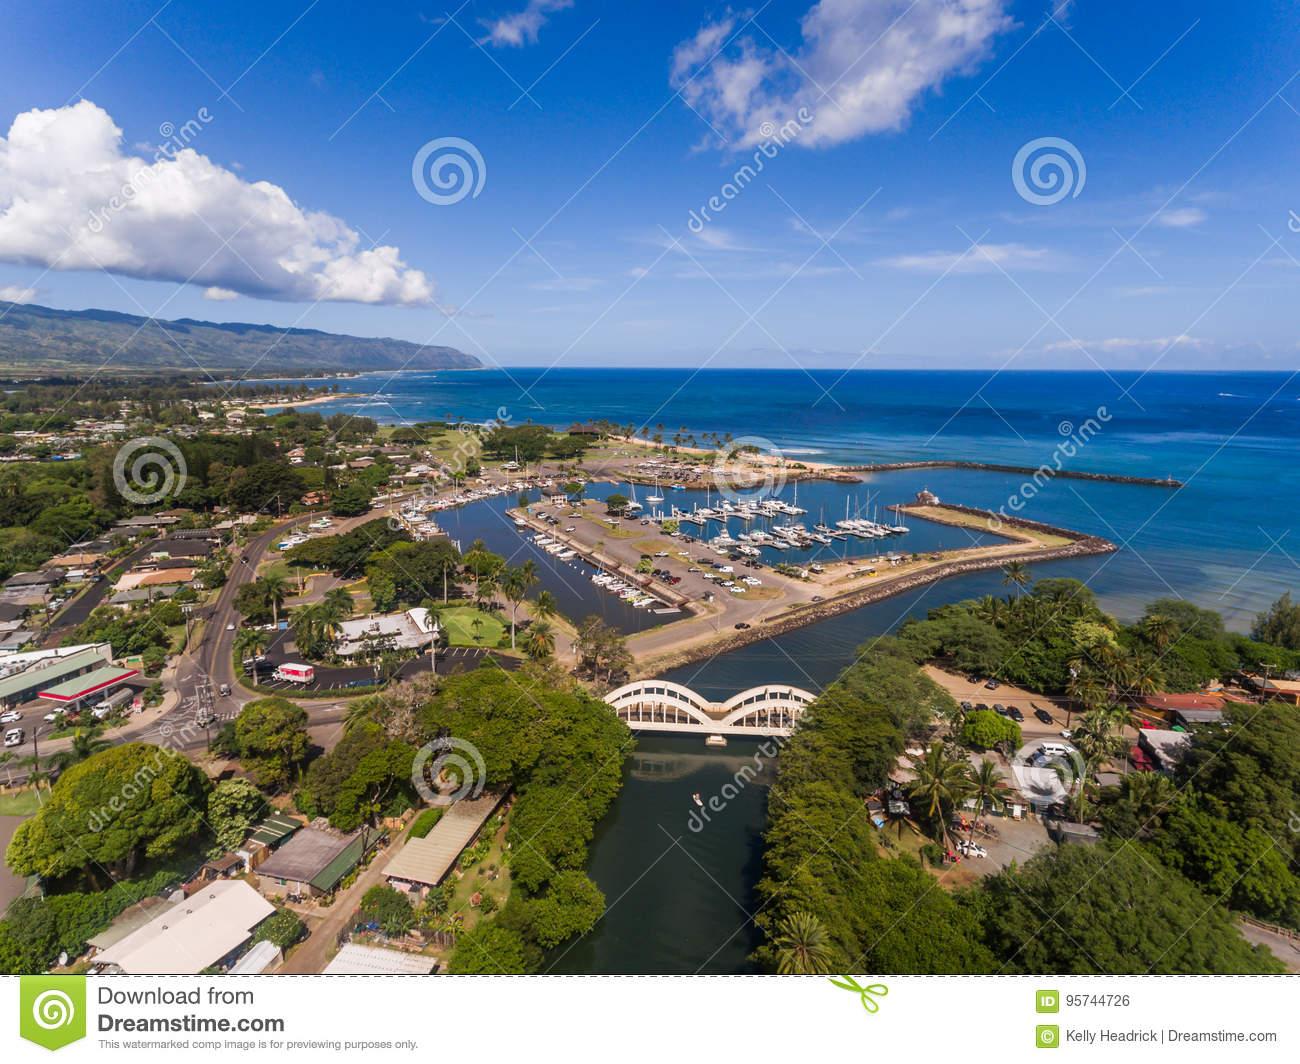 Name:  aerial-view-haleiwa-town-harbor-small-boat-anahulu-river-bridge-95744726.jpg Views: 868 Size:  241.9 KB